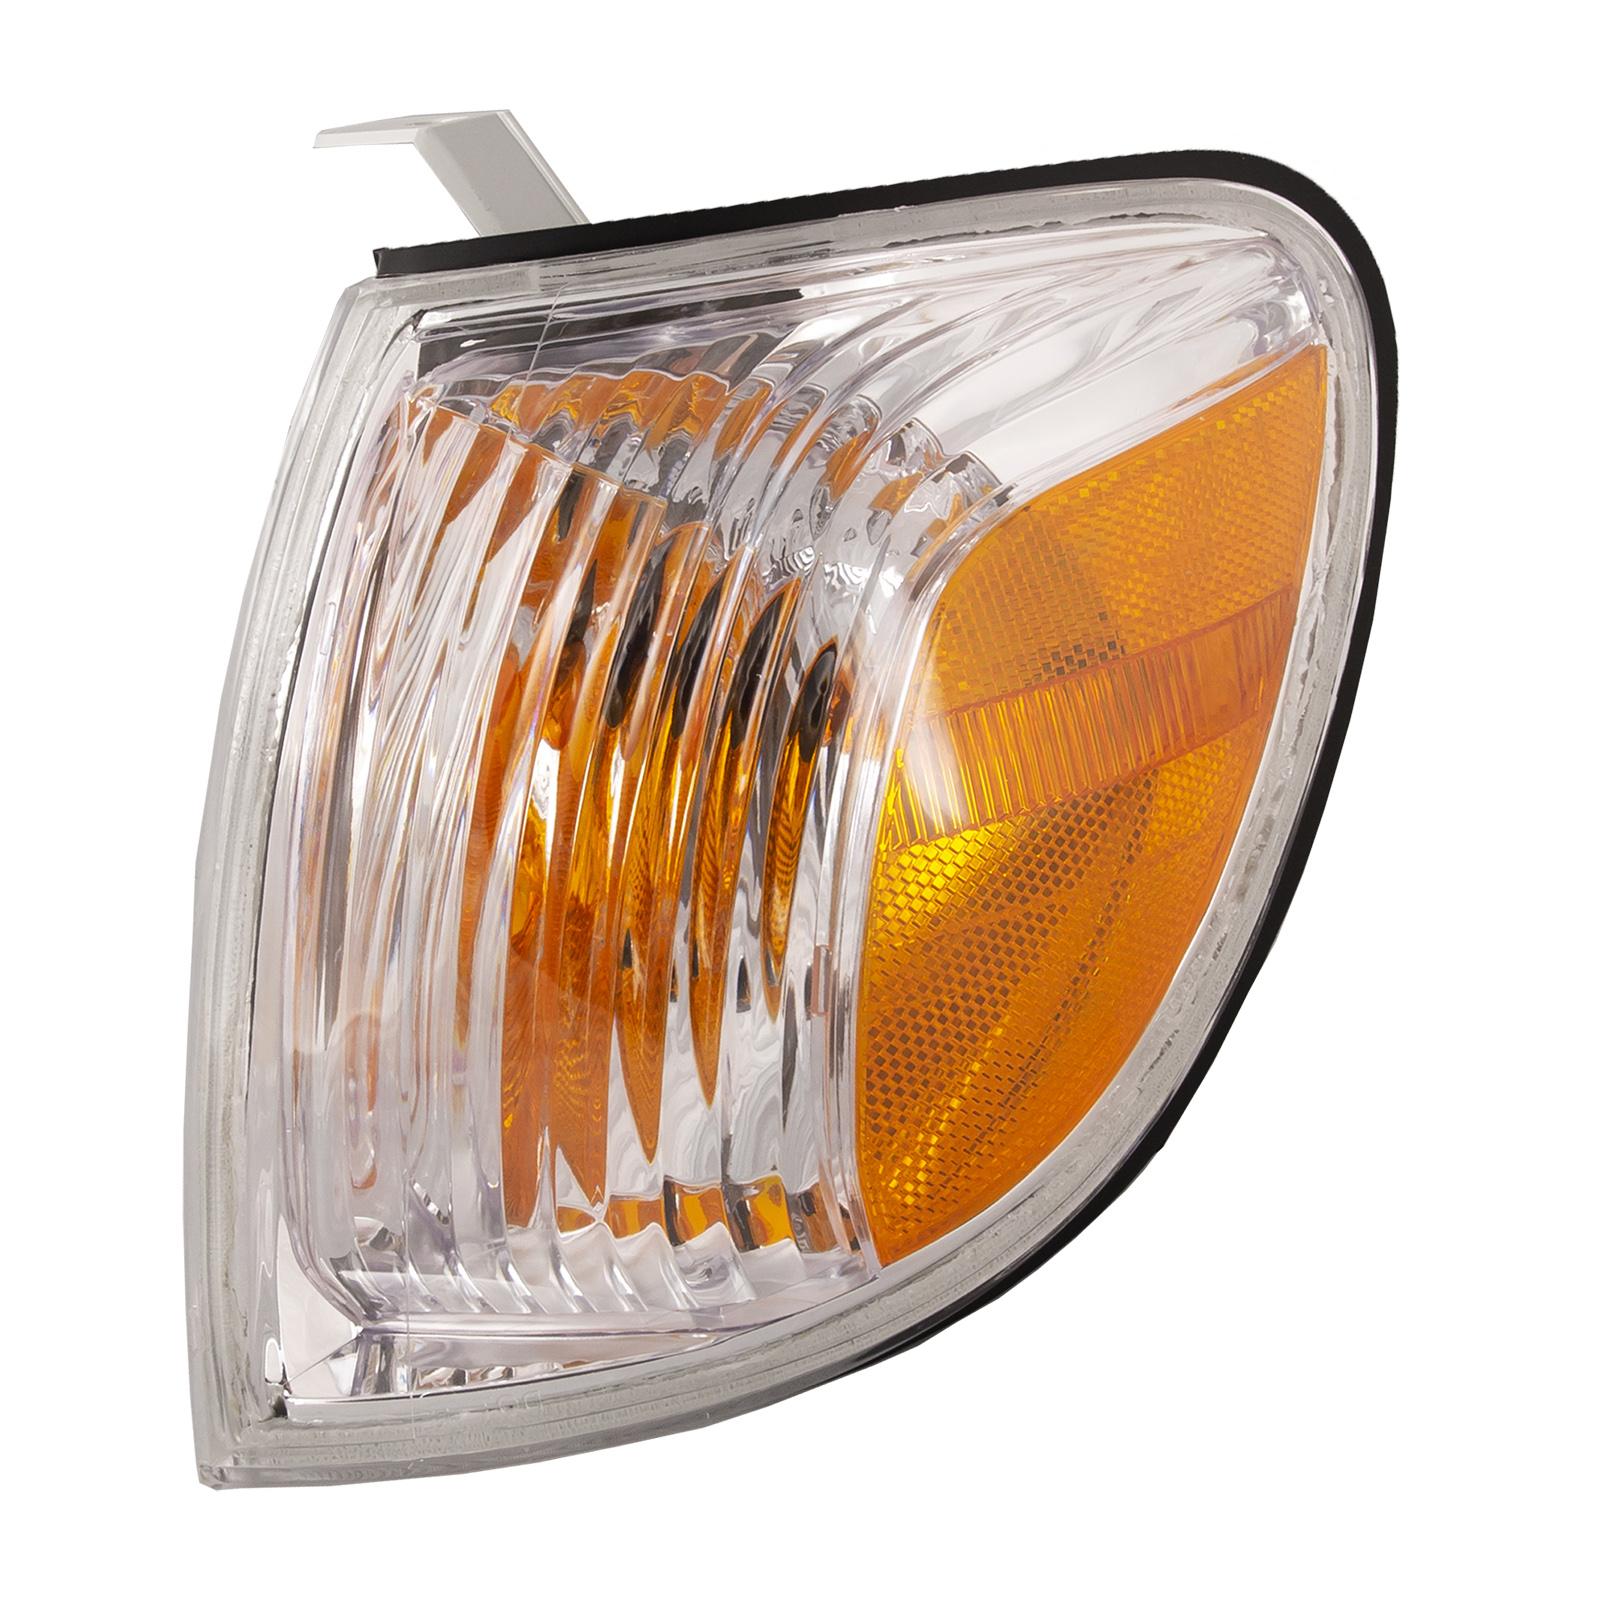 05-06 Toyota Tundra Passenger Side Signal Light Regular, Access Cab